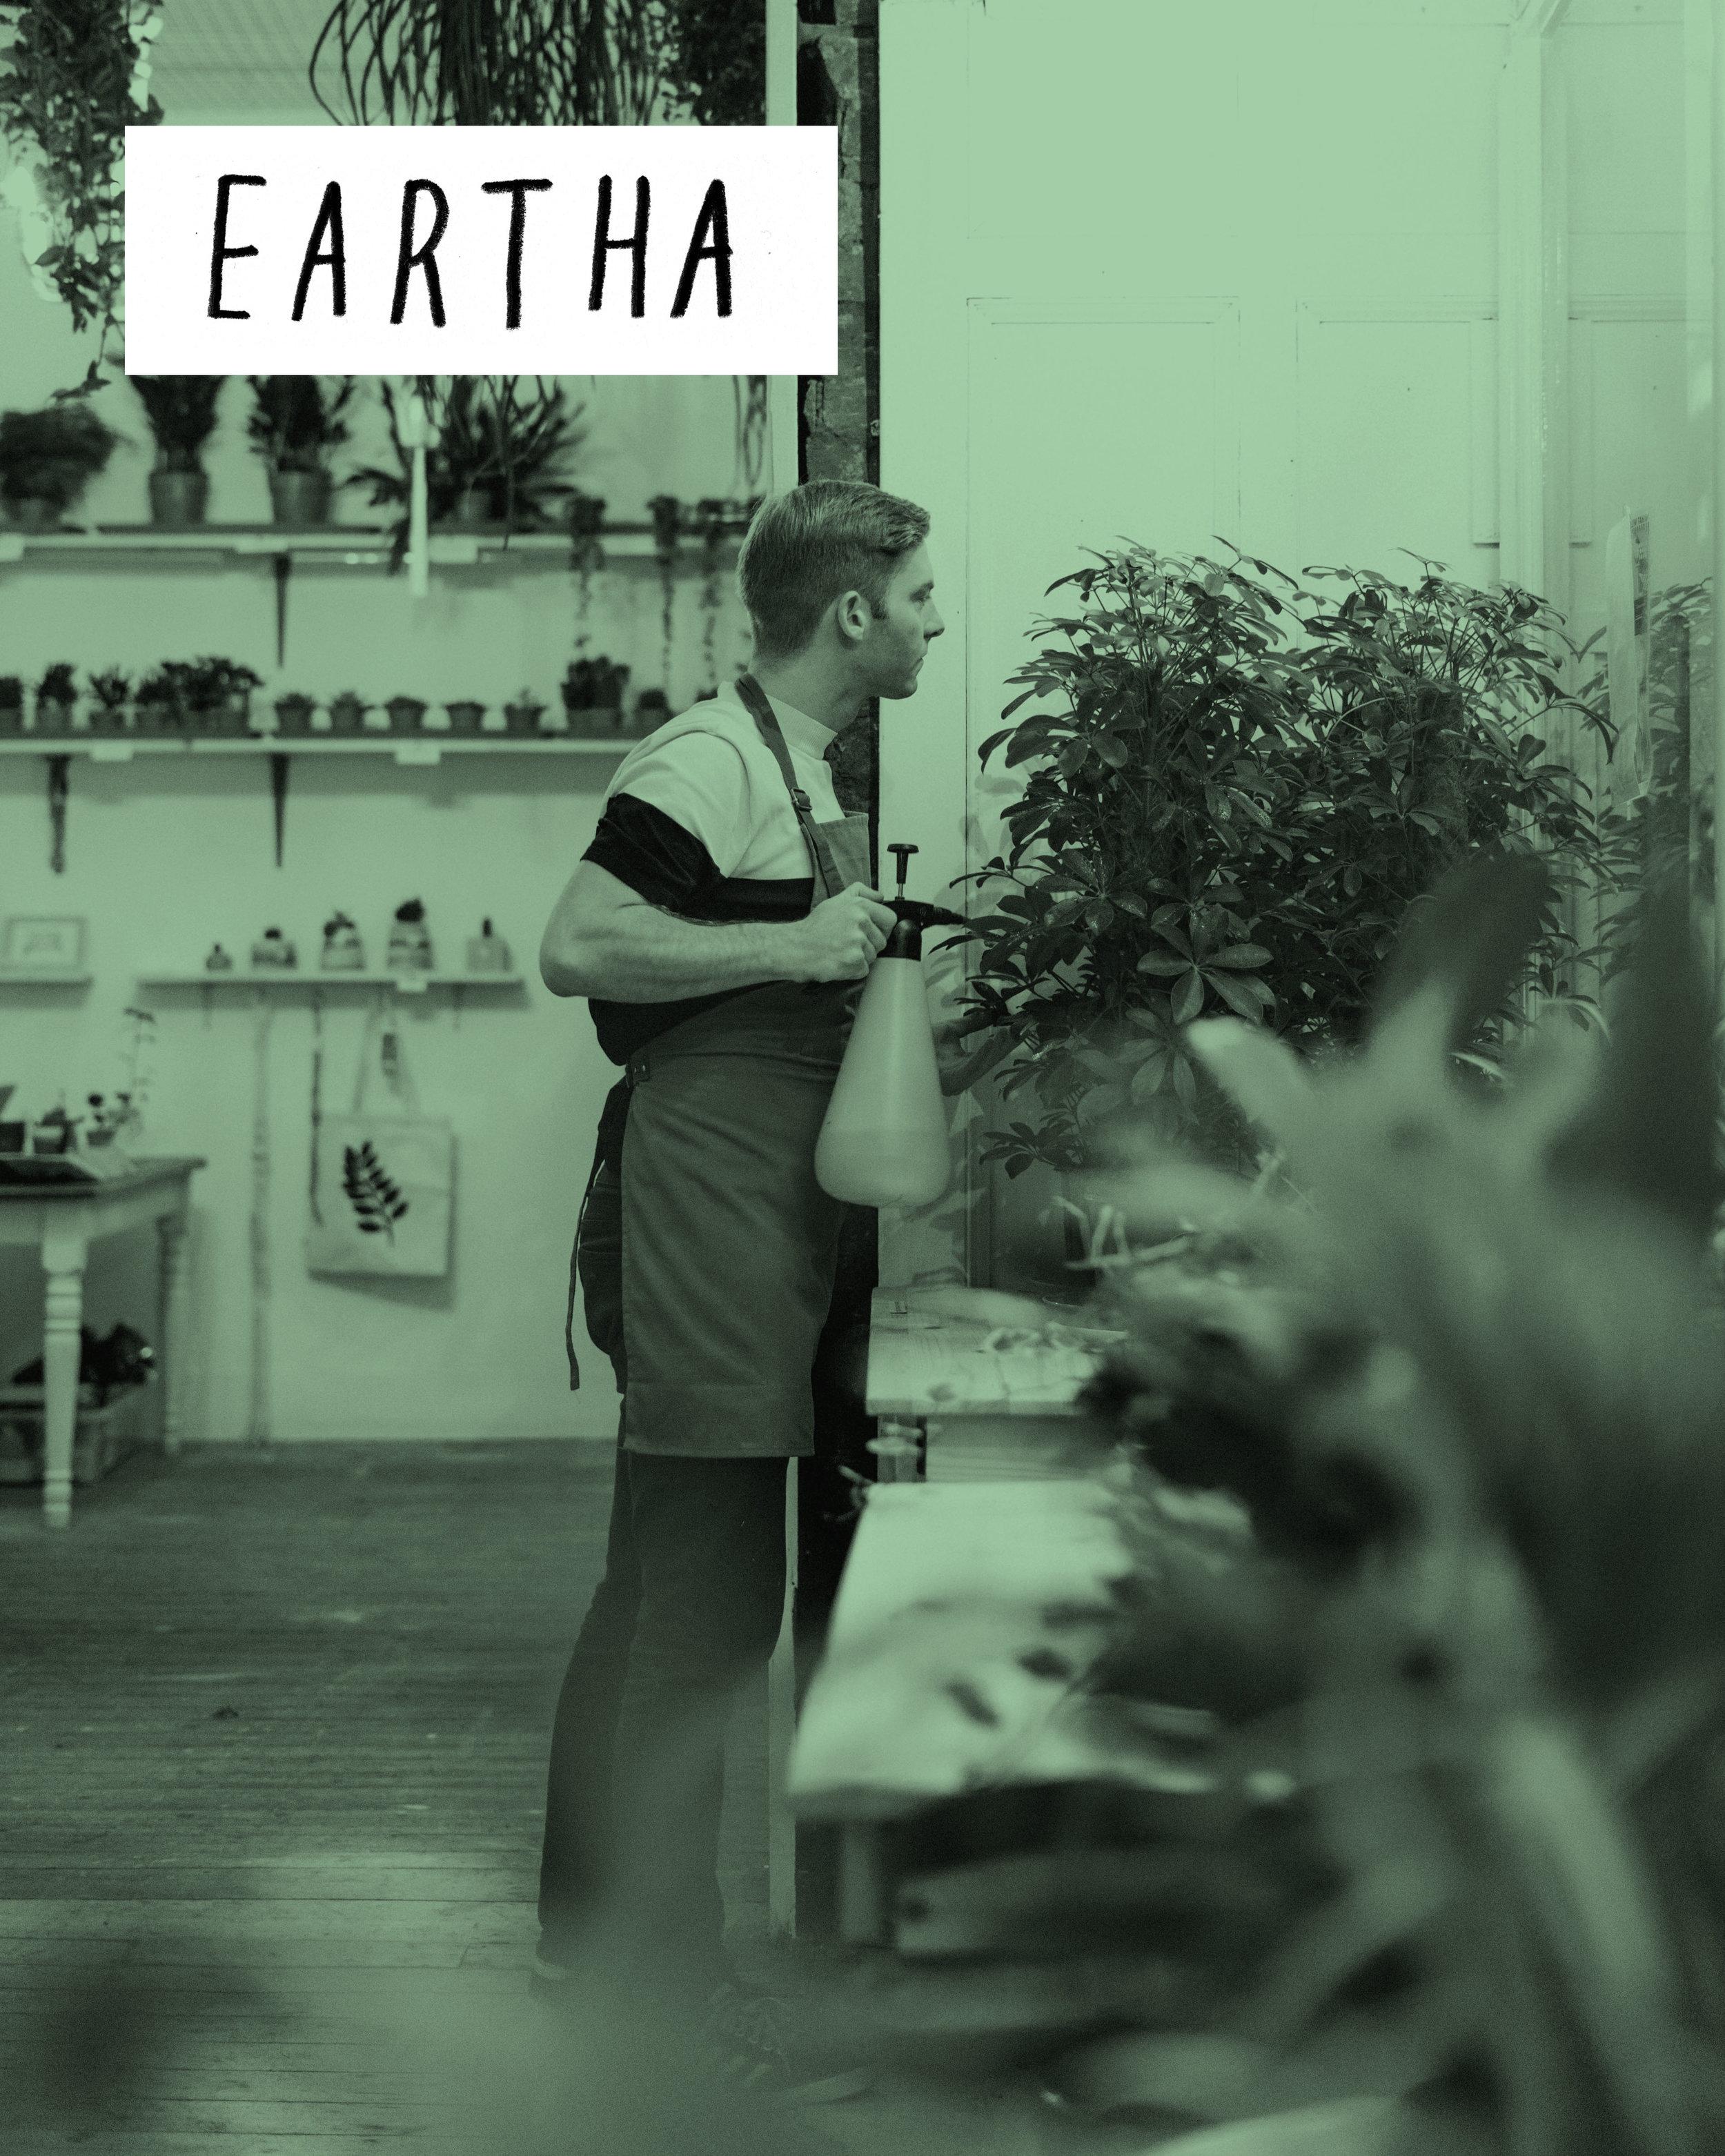 Eartha Cover Image.jpg